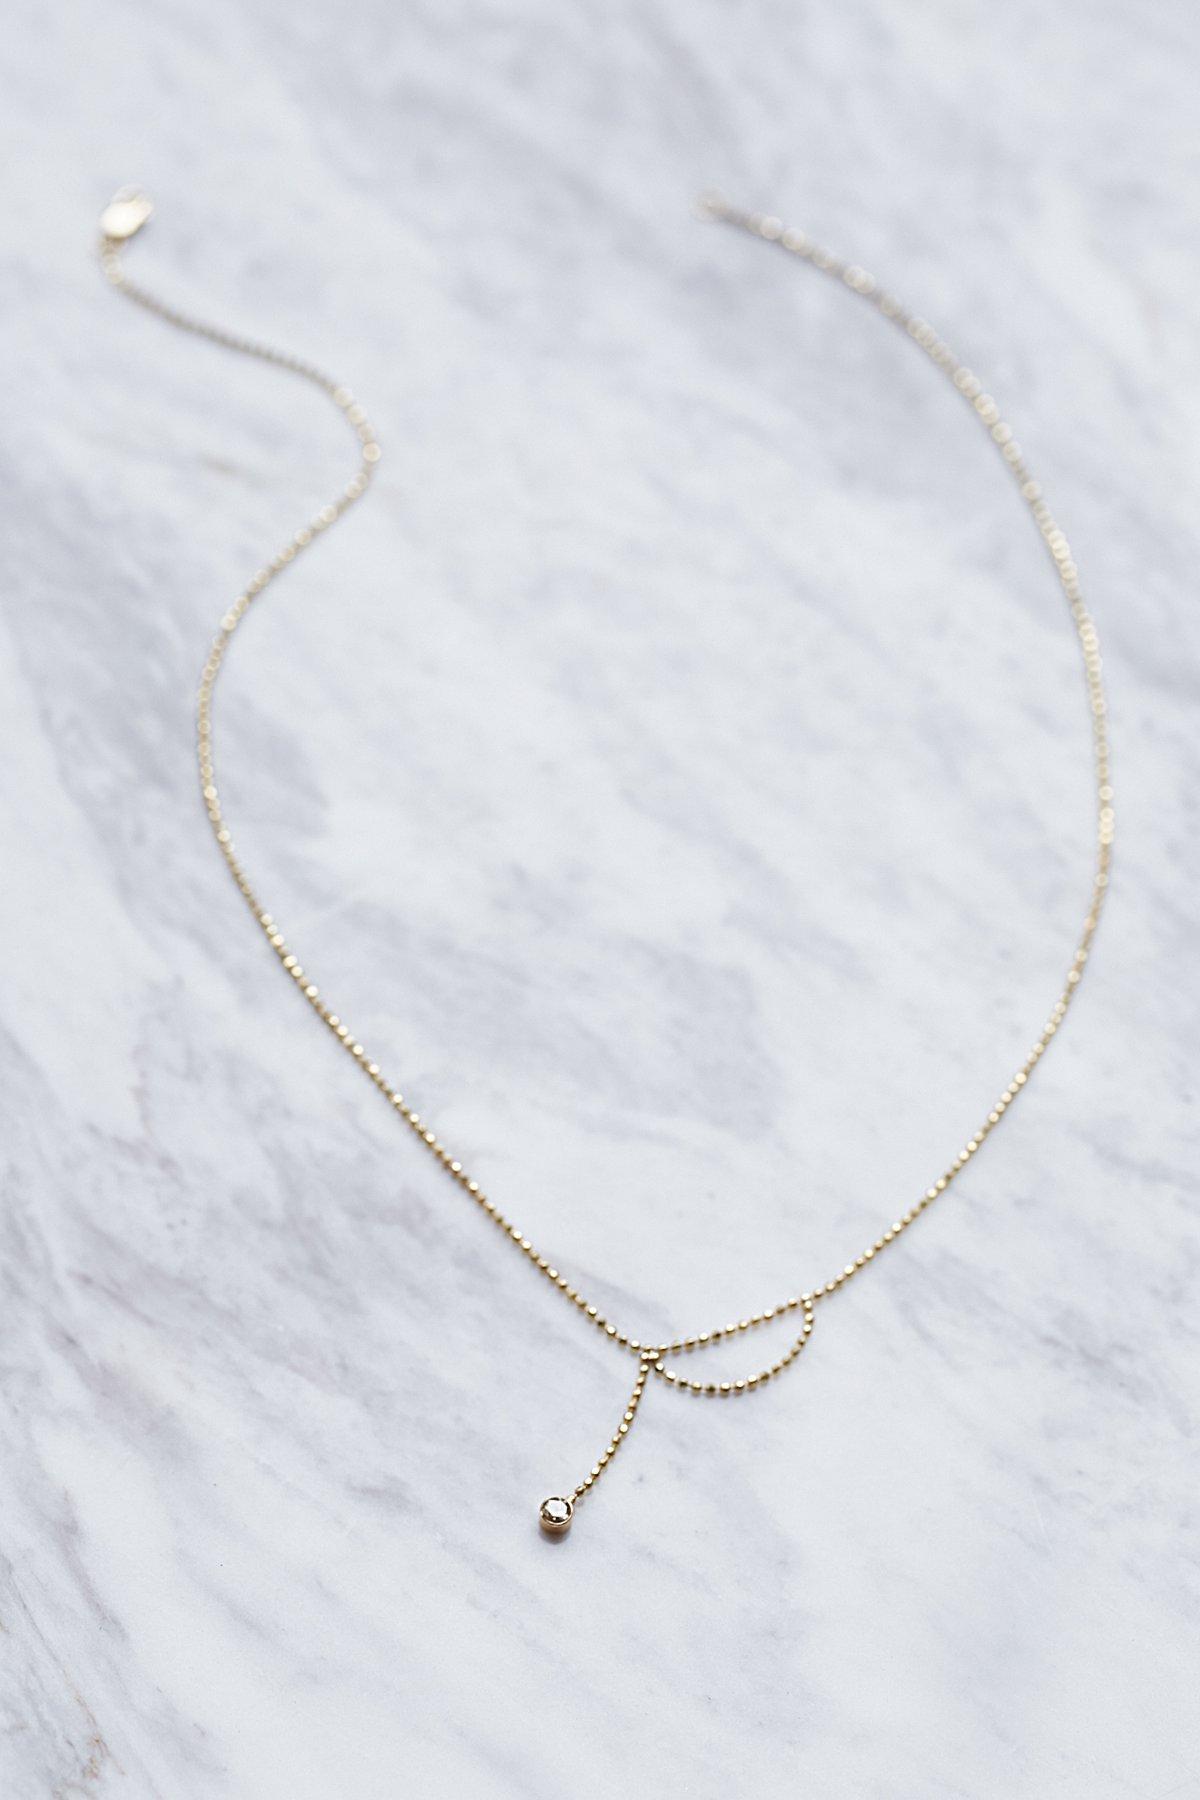 14k Ball Chain Diamond Necklace